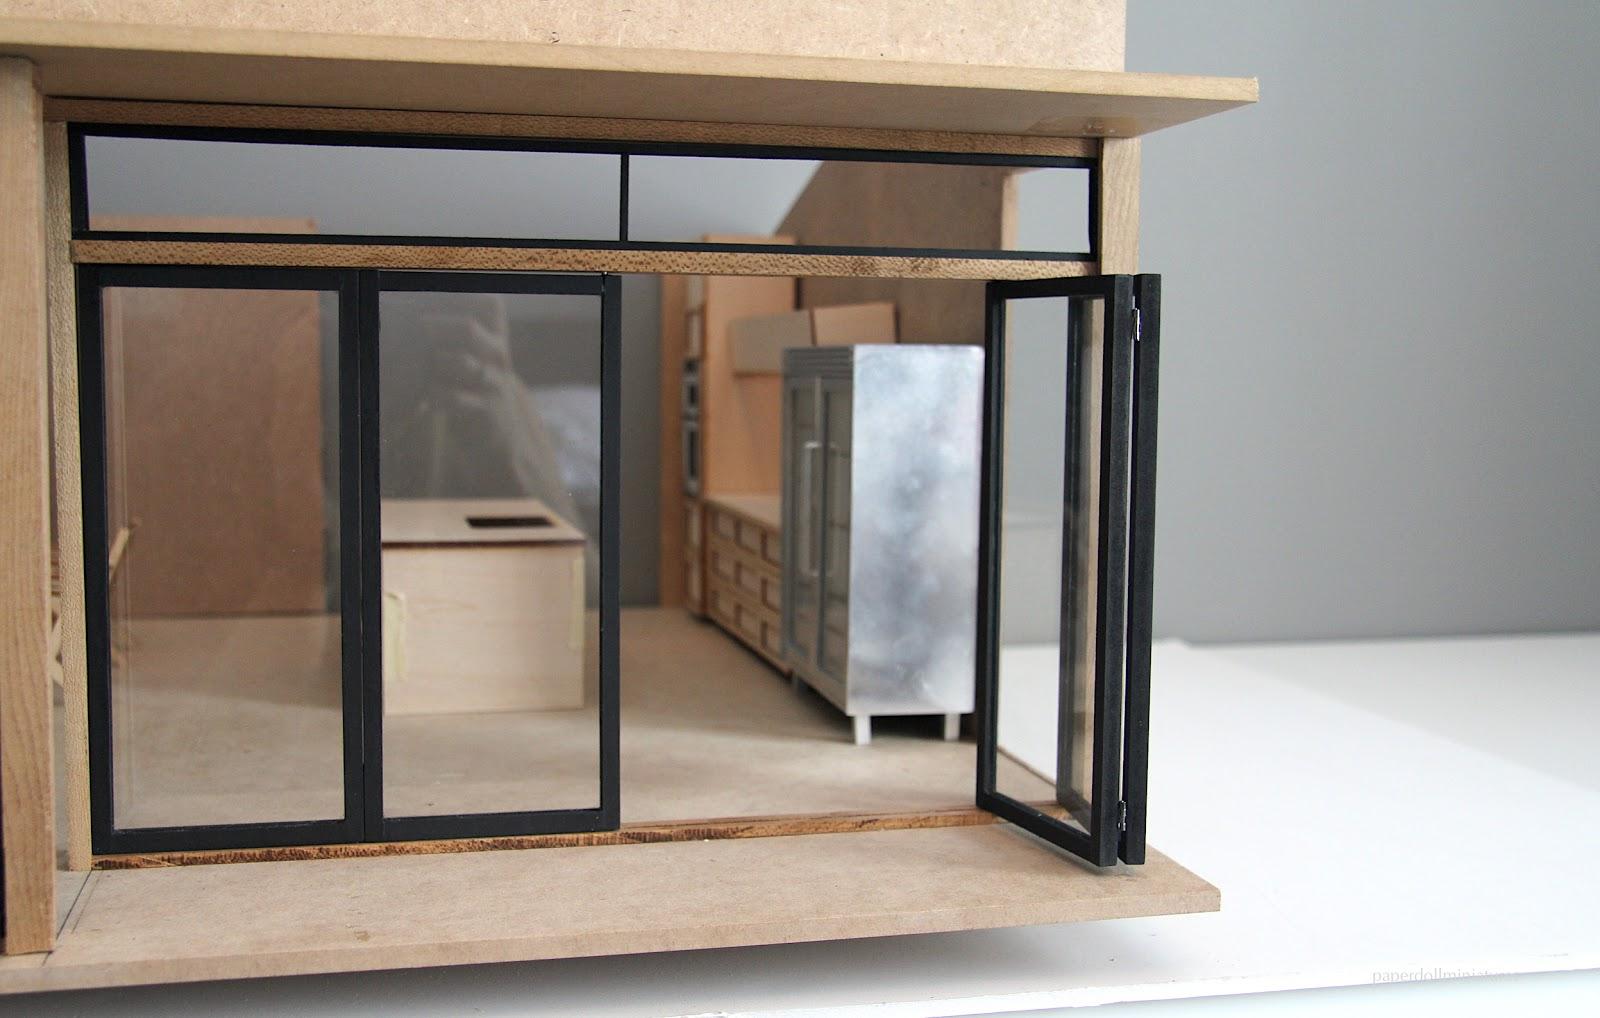 & Modern Miniature Folding Doors Update Pezcame.Com